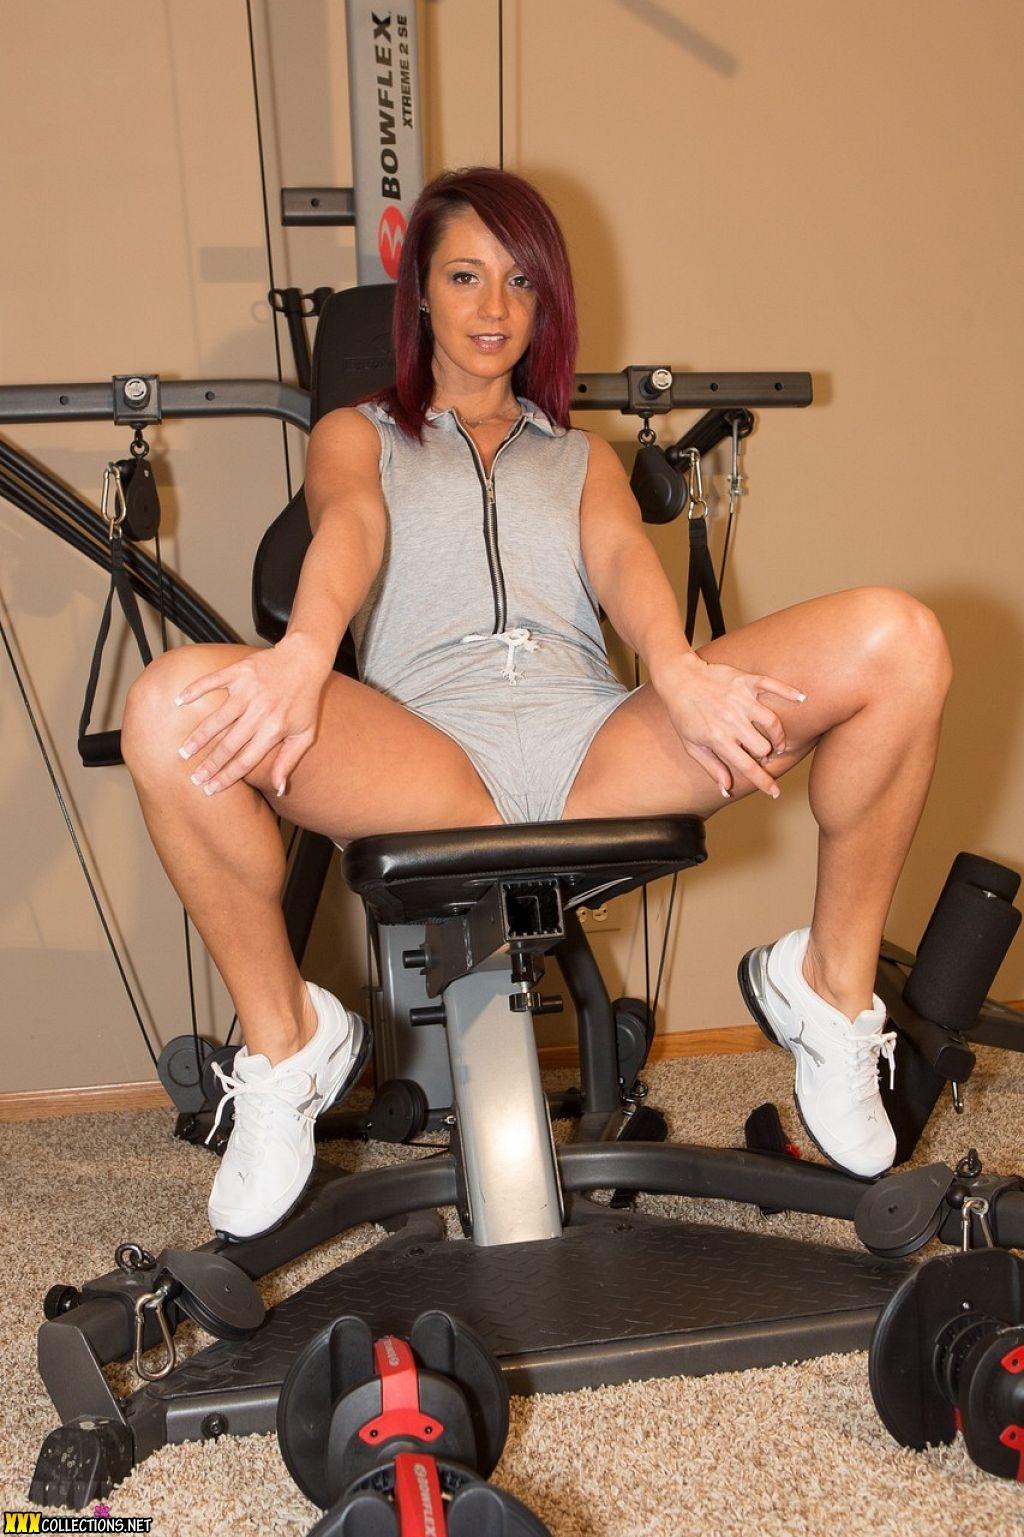 Nikki sims sexvideo pics adult scene